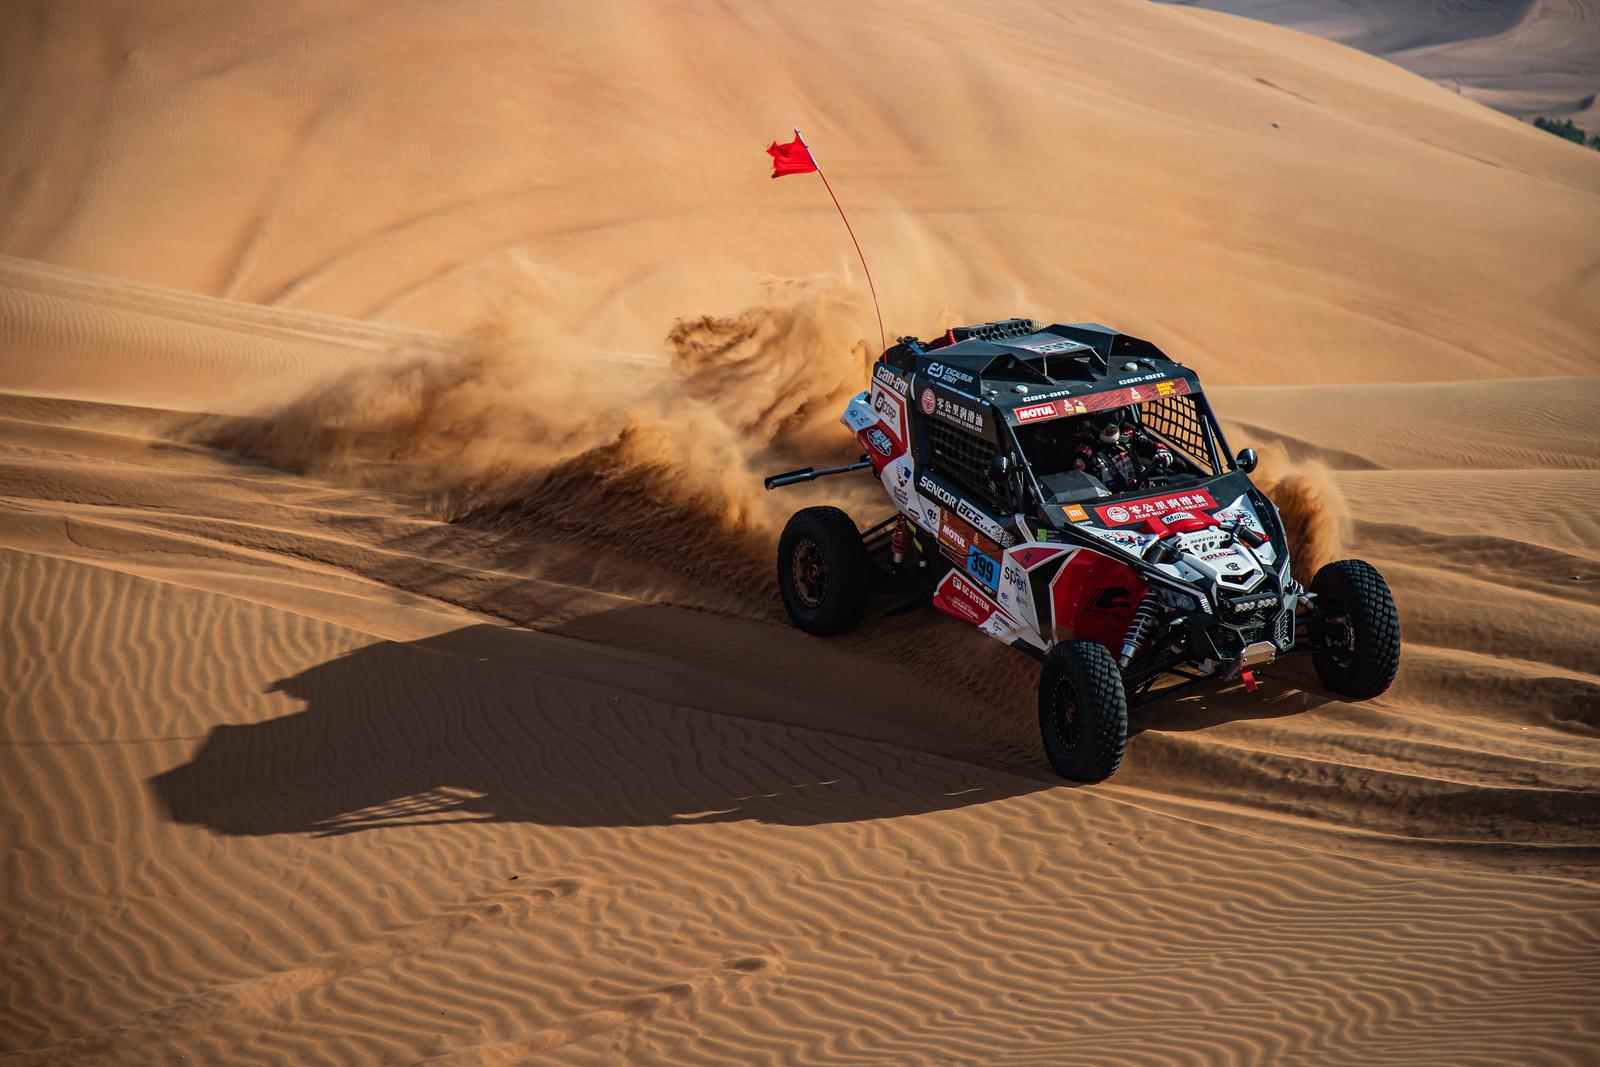 20210617_Test_rally_UAE_MP_IMG_0047